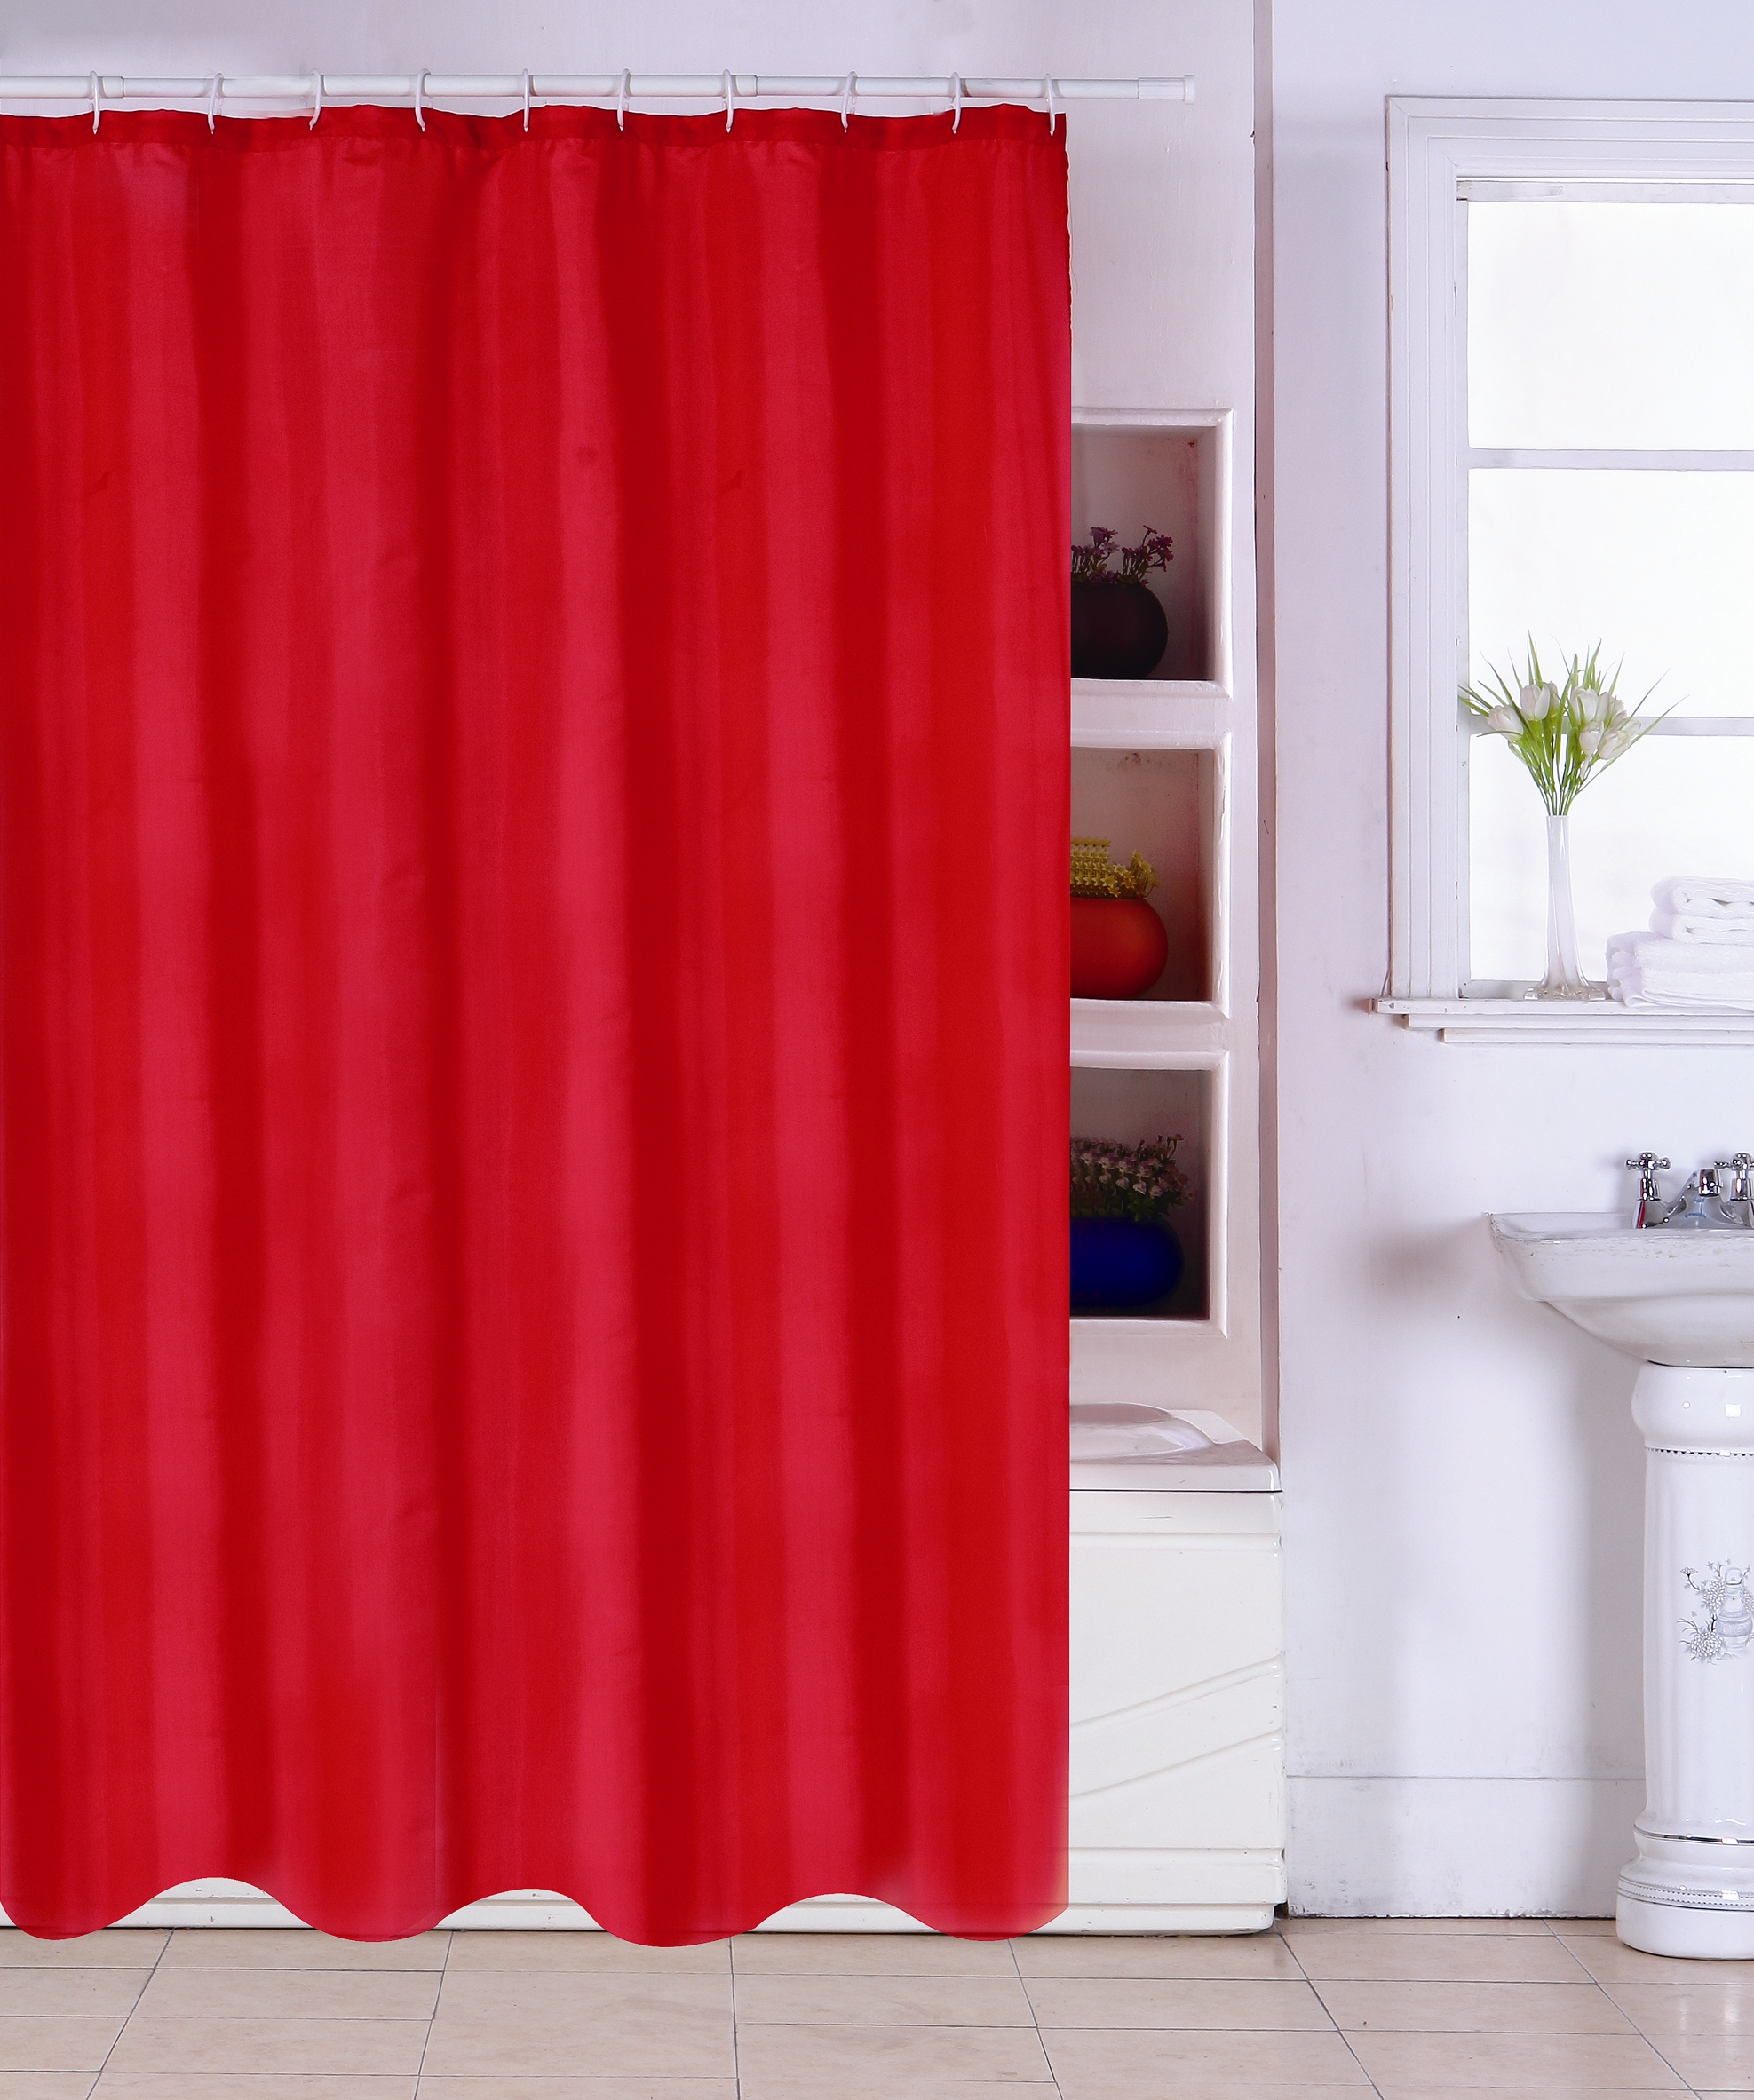 MSV Duschvorhang 180x200cm Anti Schimmel Textil Badewannenvorhang Wannenvorhang Rot